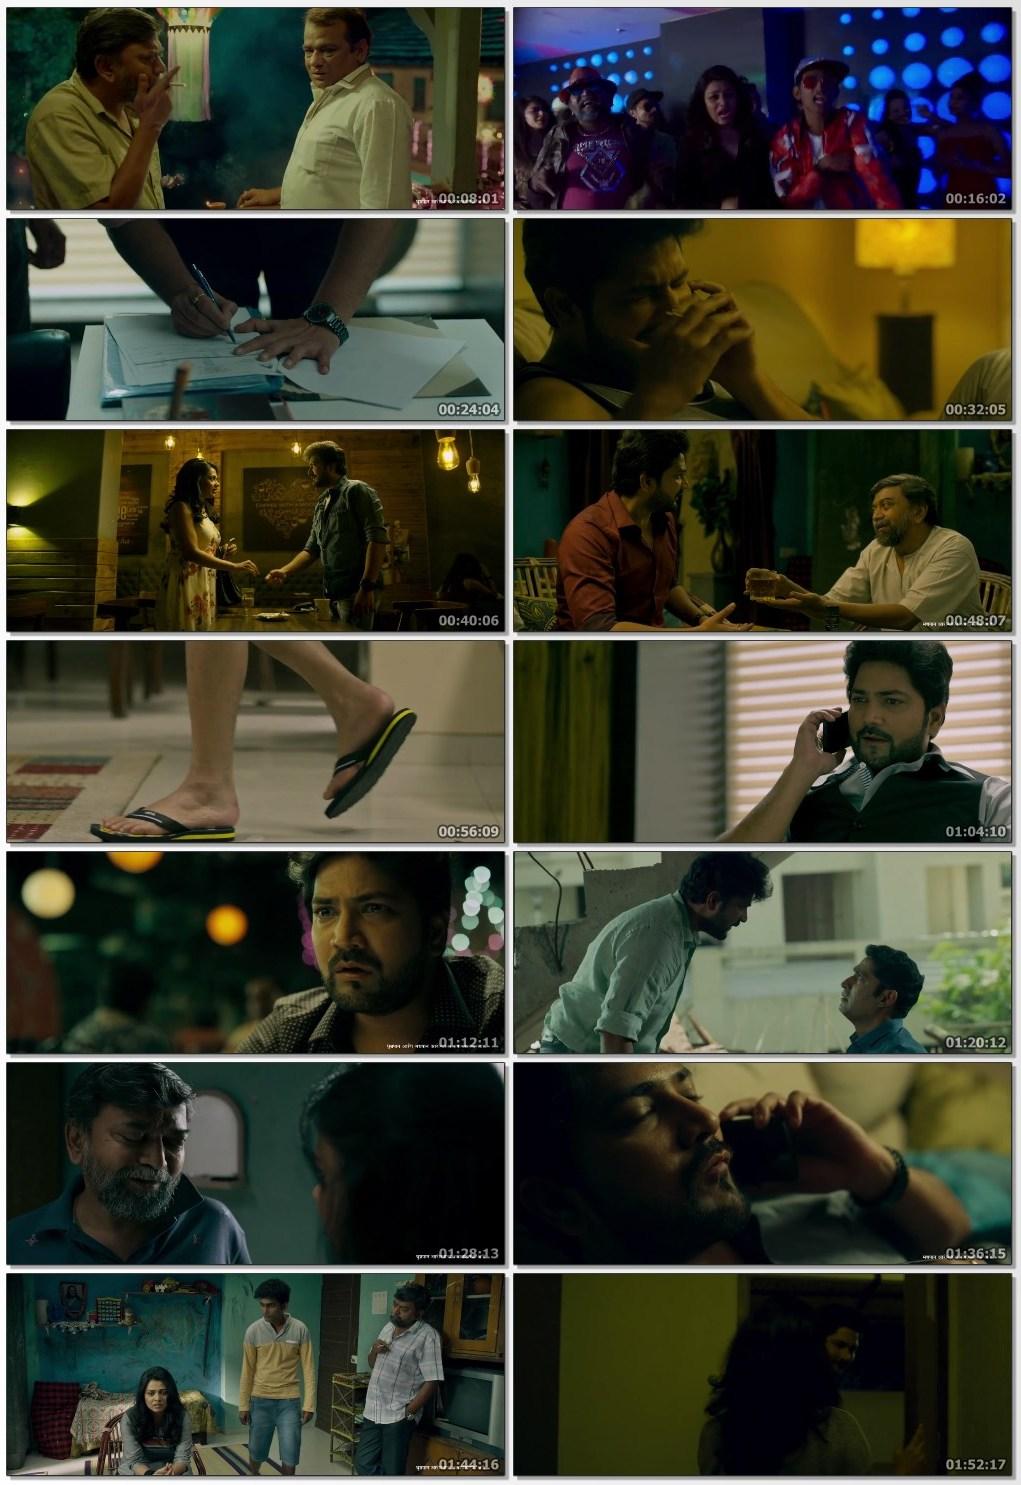 maska marathi movie download free, maska marathi movie download 300mb, maska marathi movie download 480p, maska marathi movie download 720p